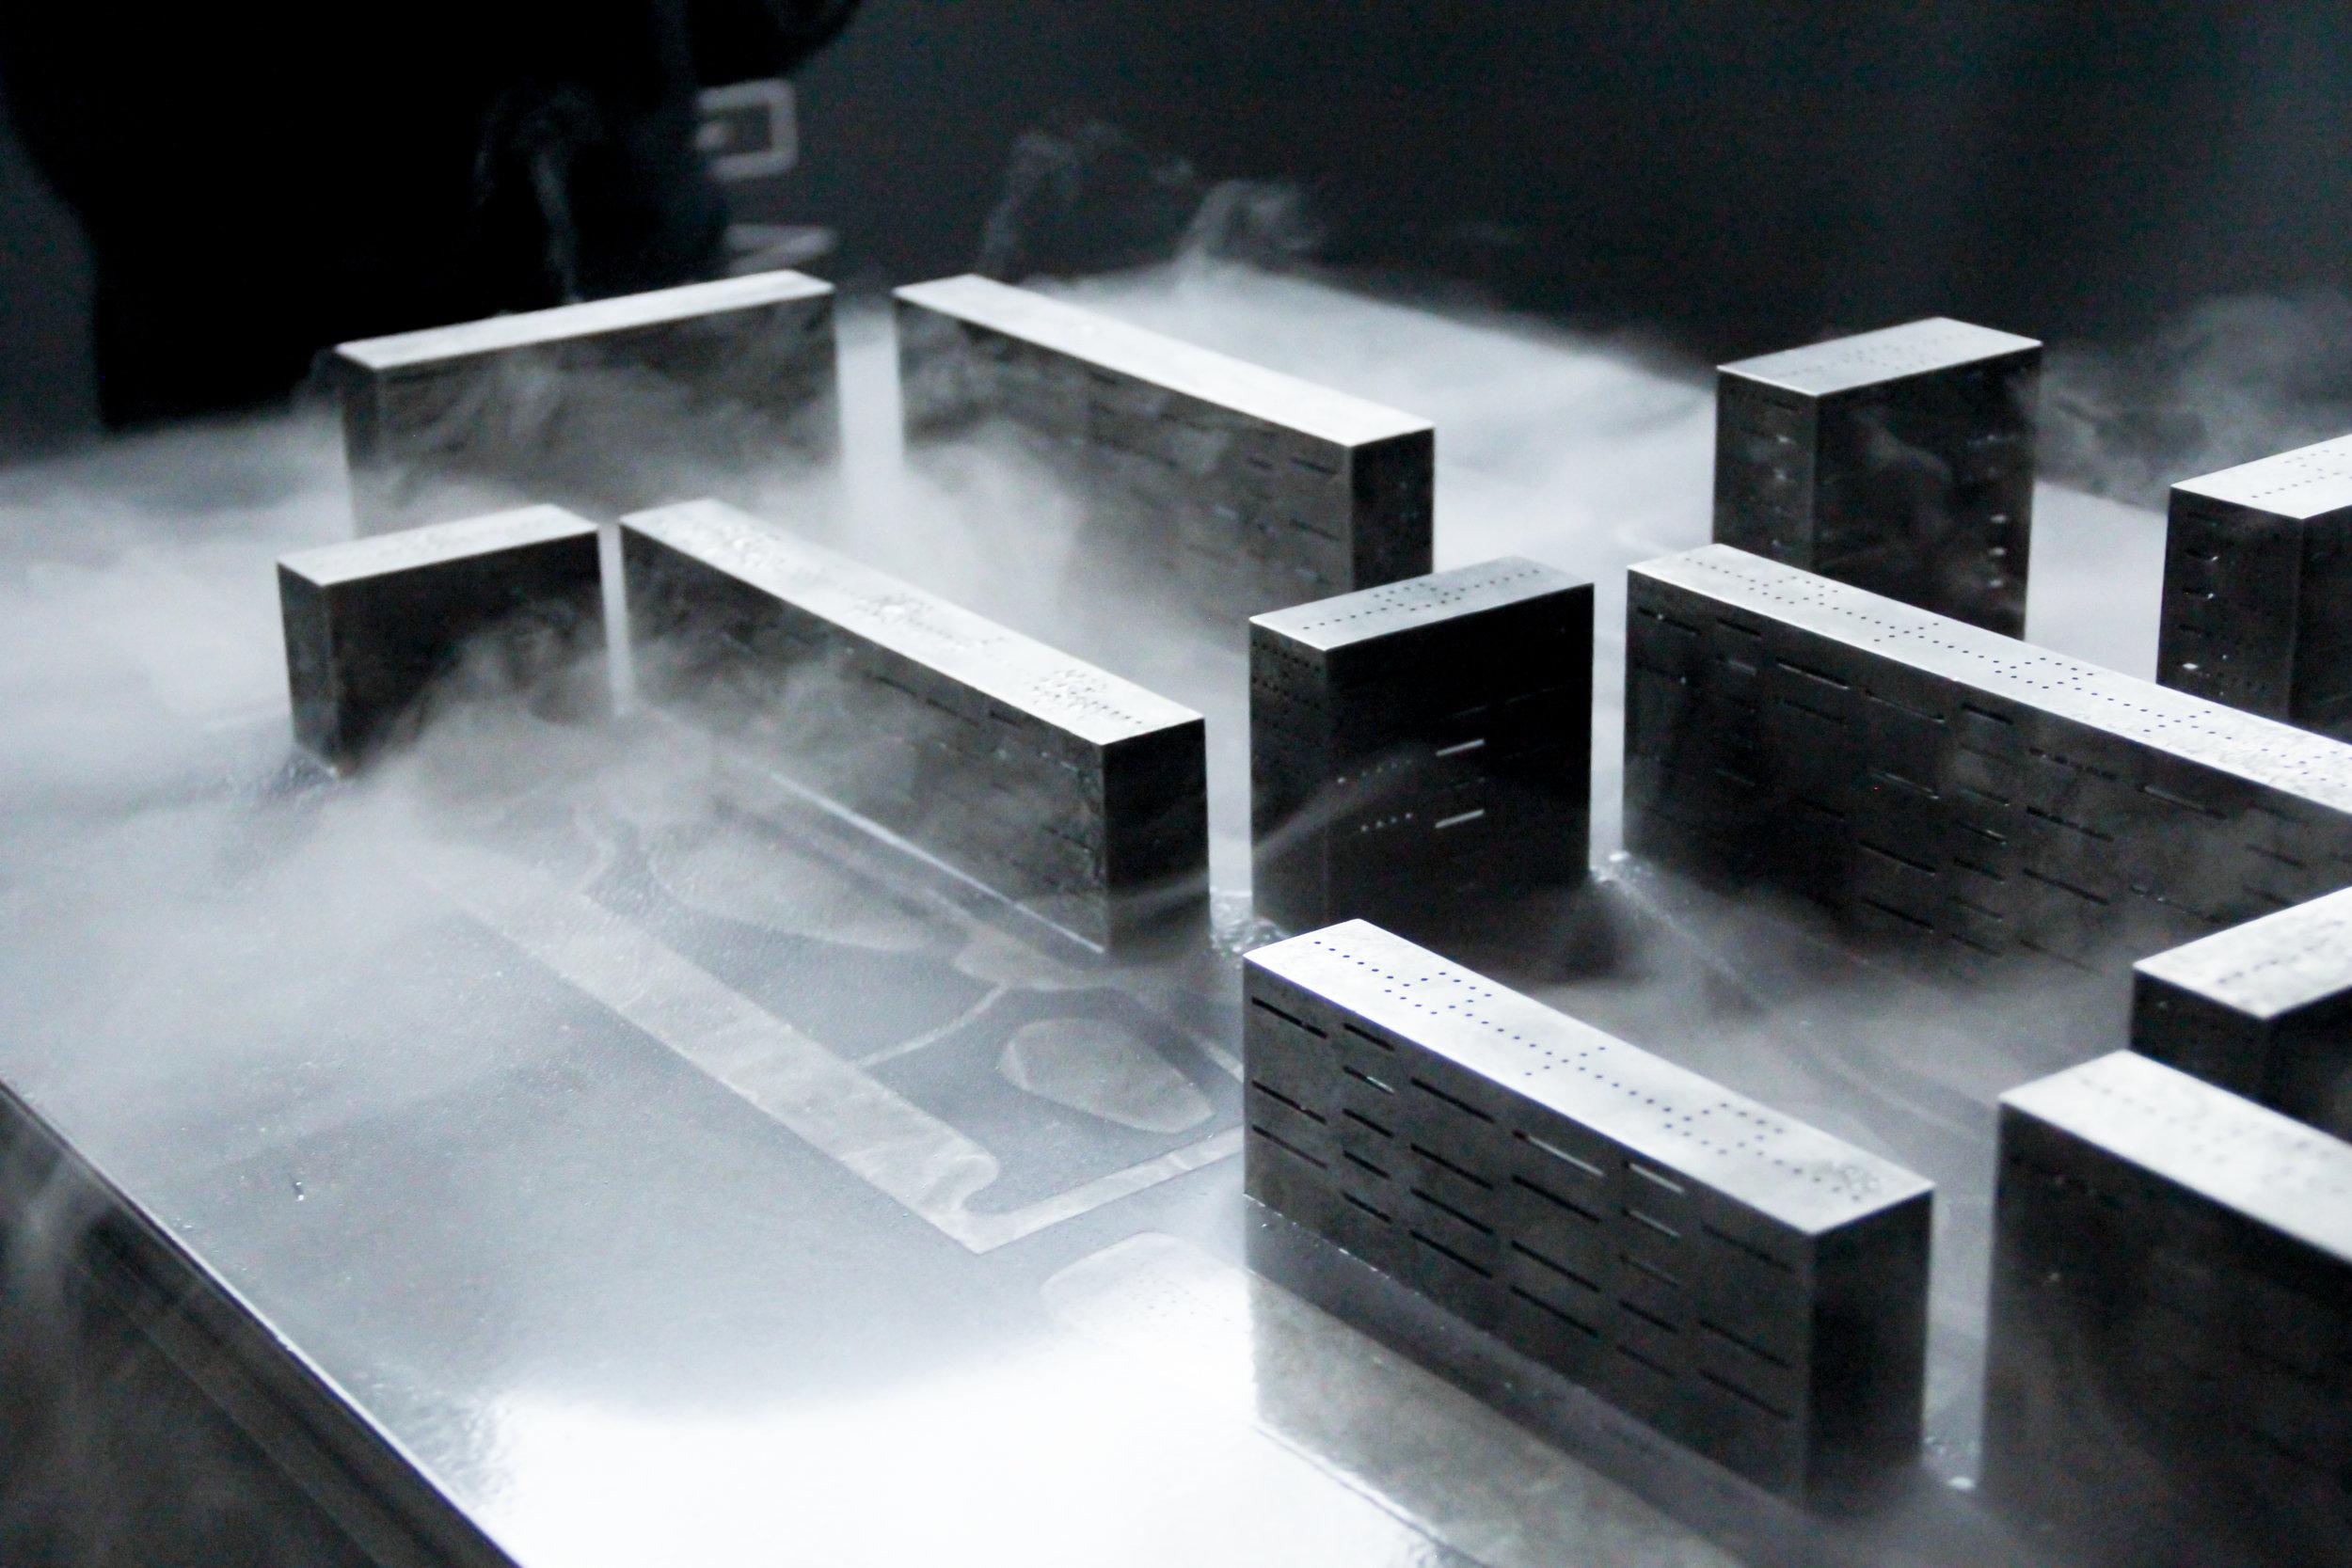 The Dutch Pavilion. Biennale of Architecture 2018. Image ©FUTURECRAFTER